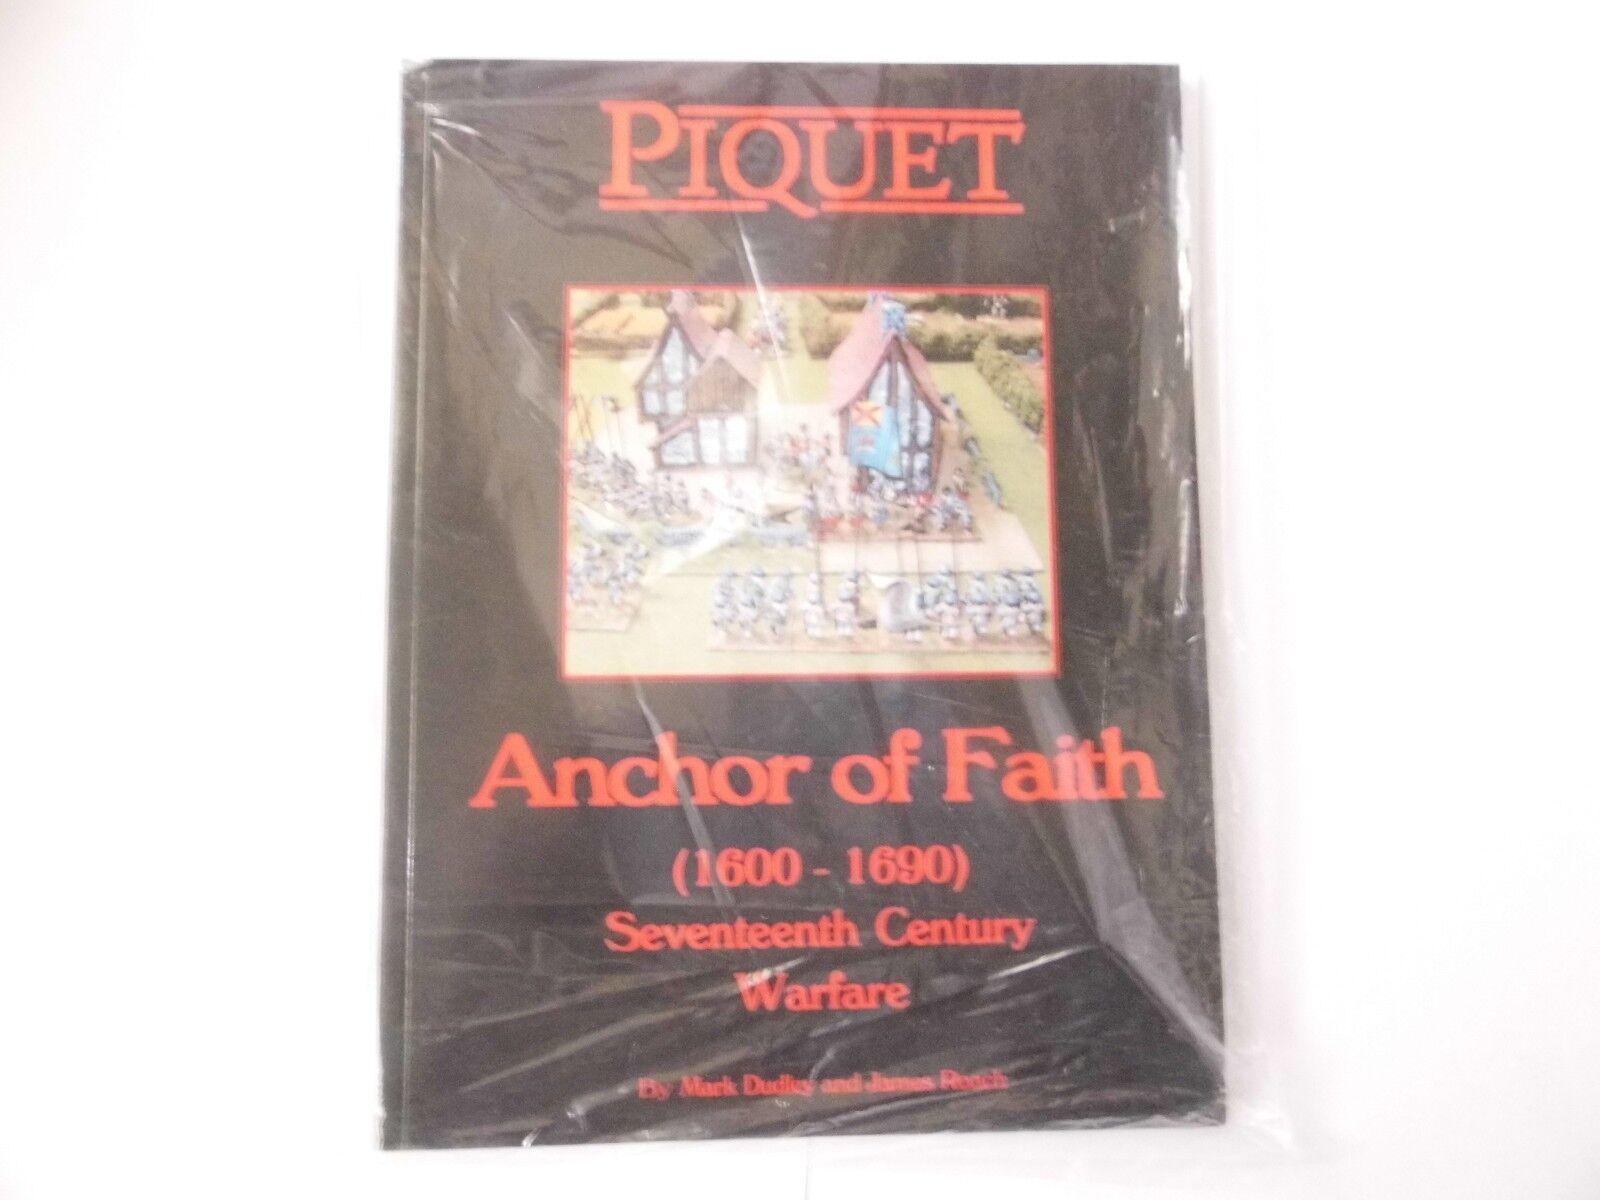 PIQUET - ANCHOR OF FAITH  (1600-1690)  - WAR GAMES RULES - NEW